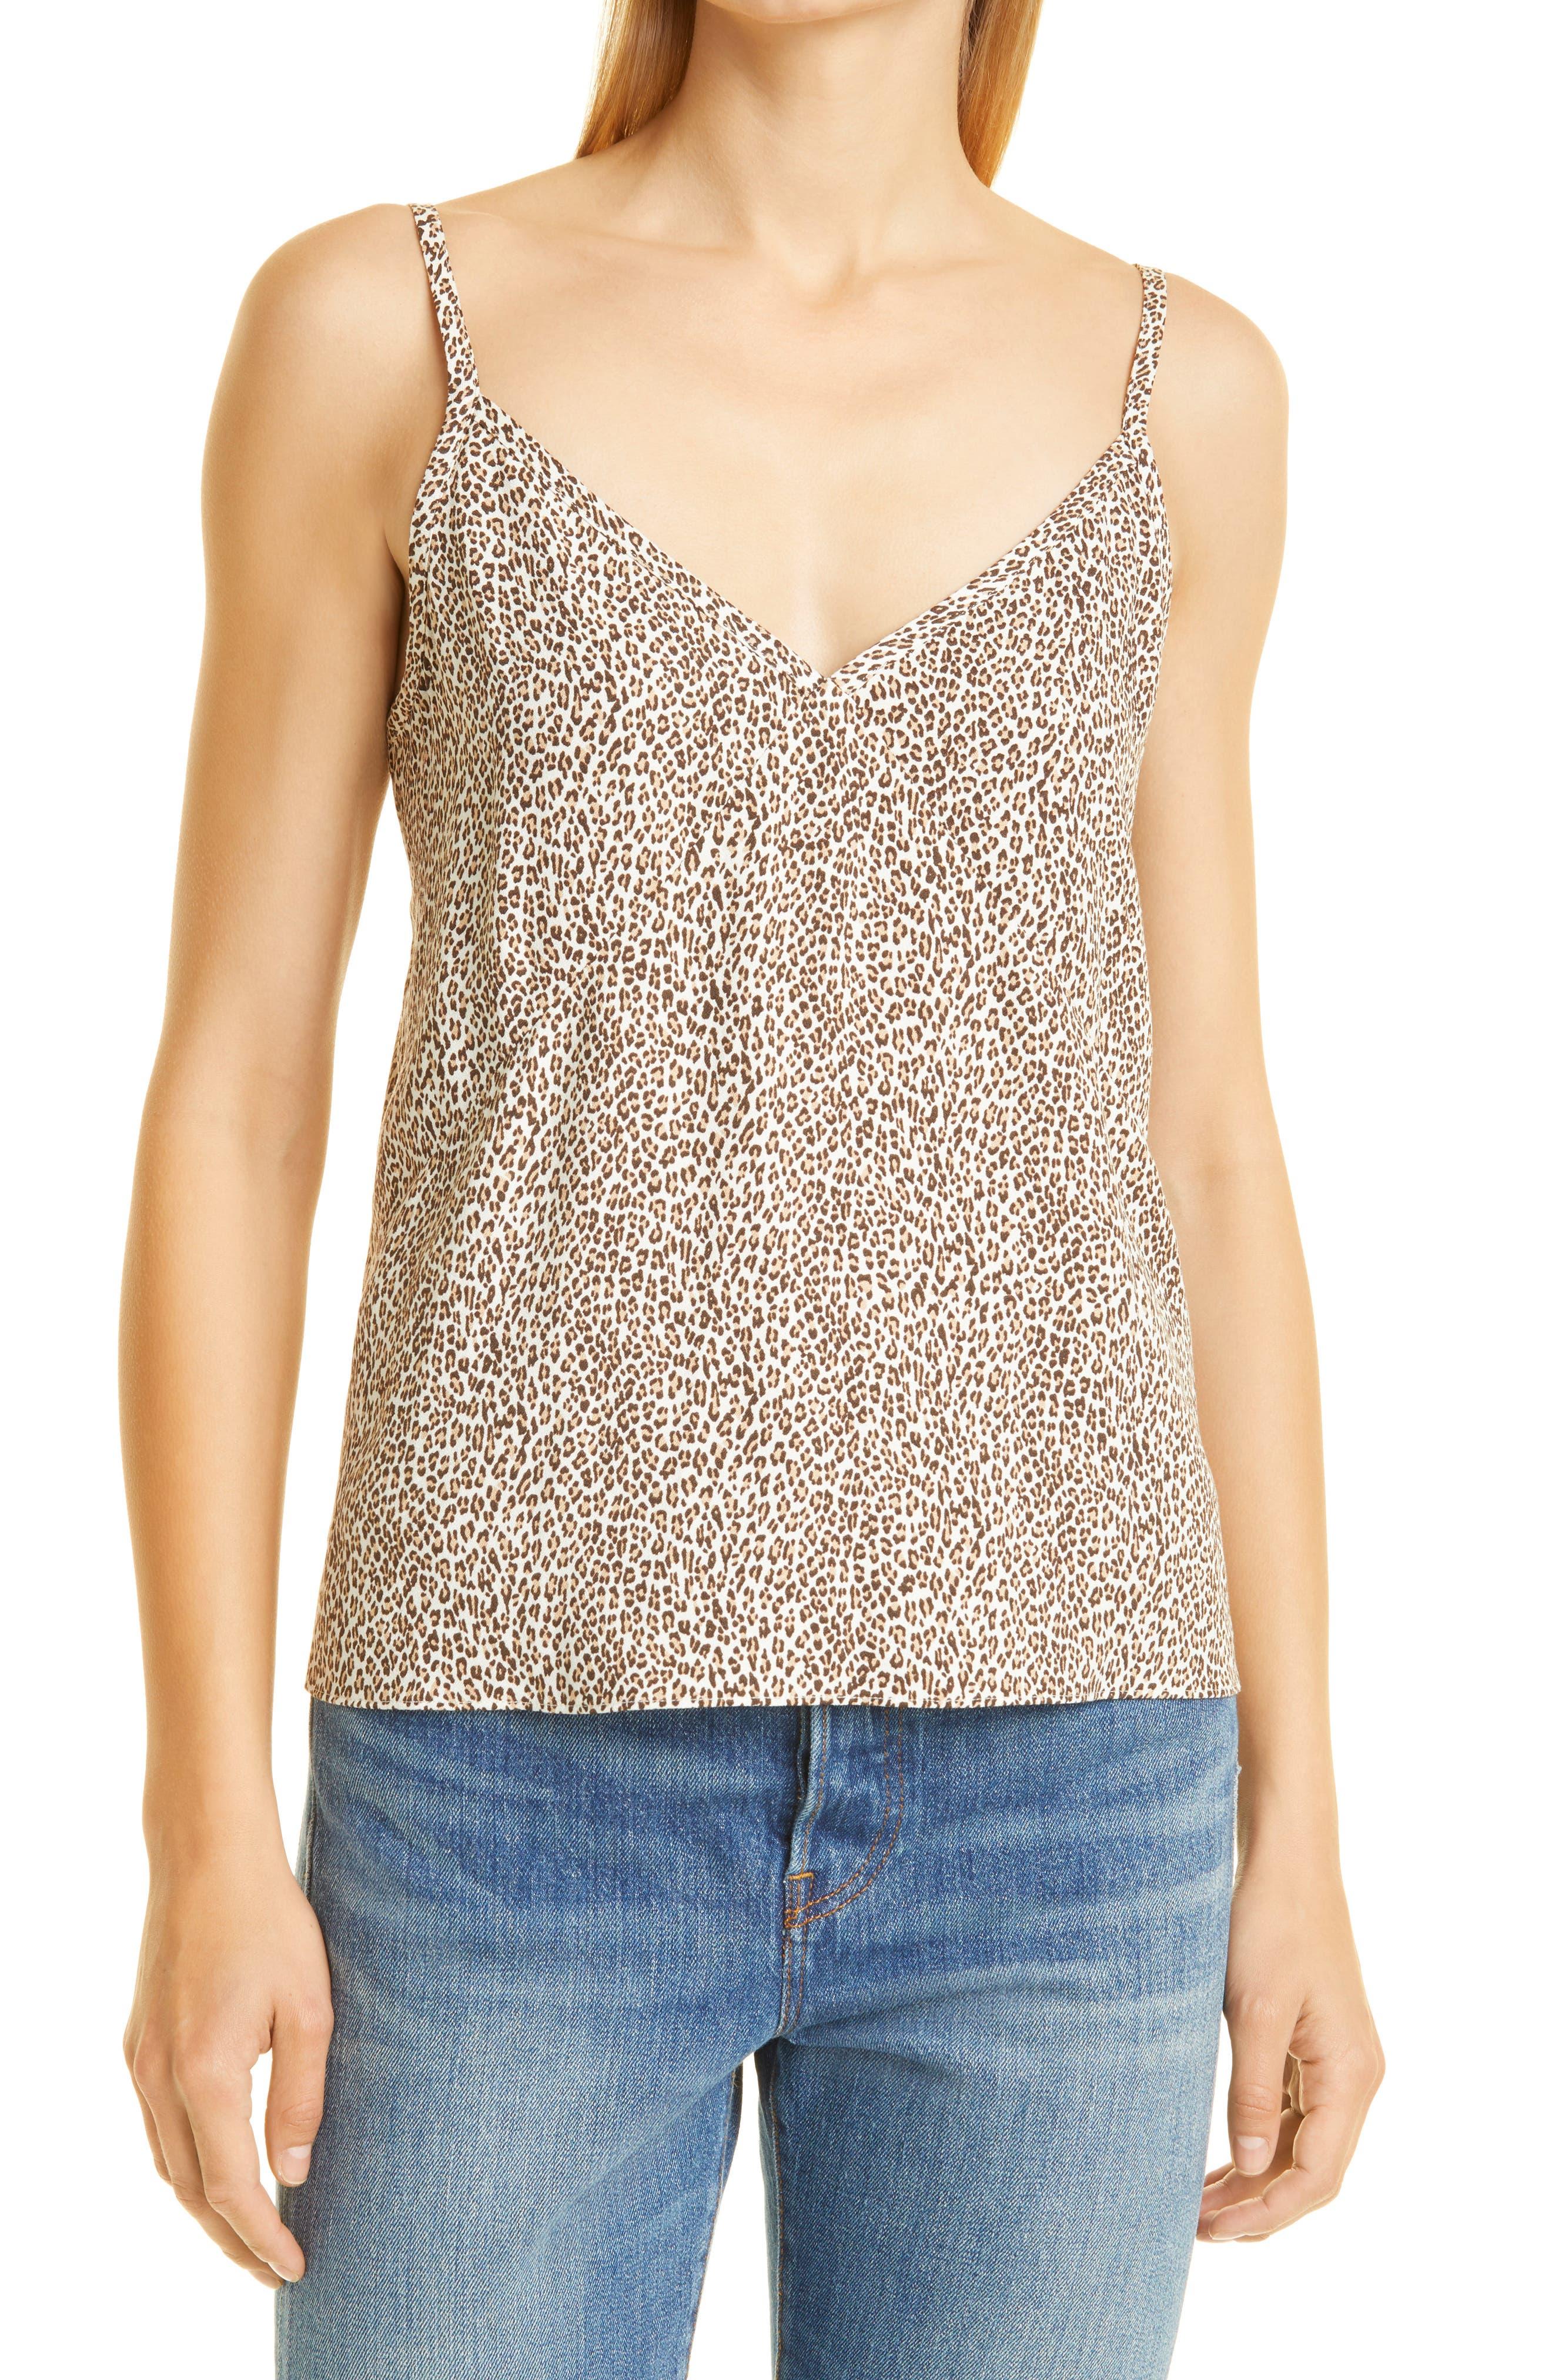 Leopard Print Camisole